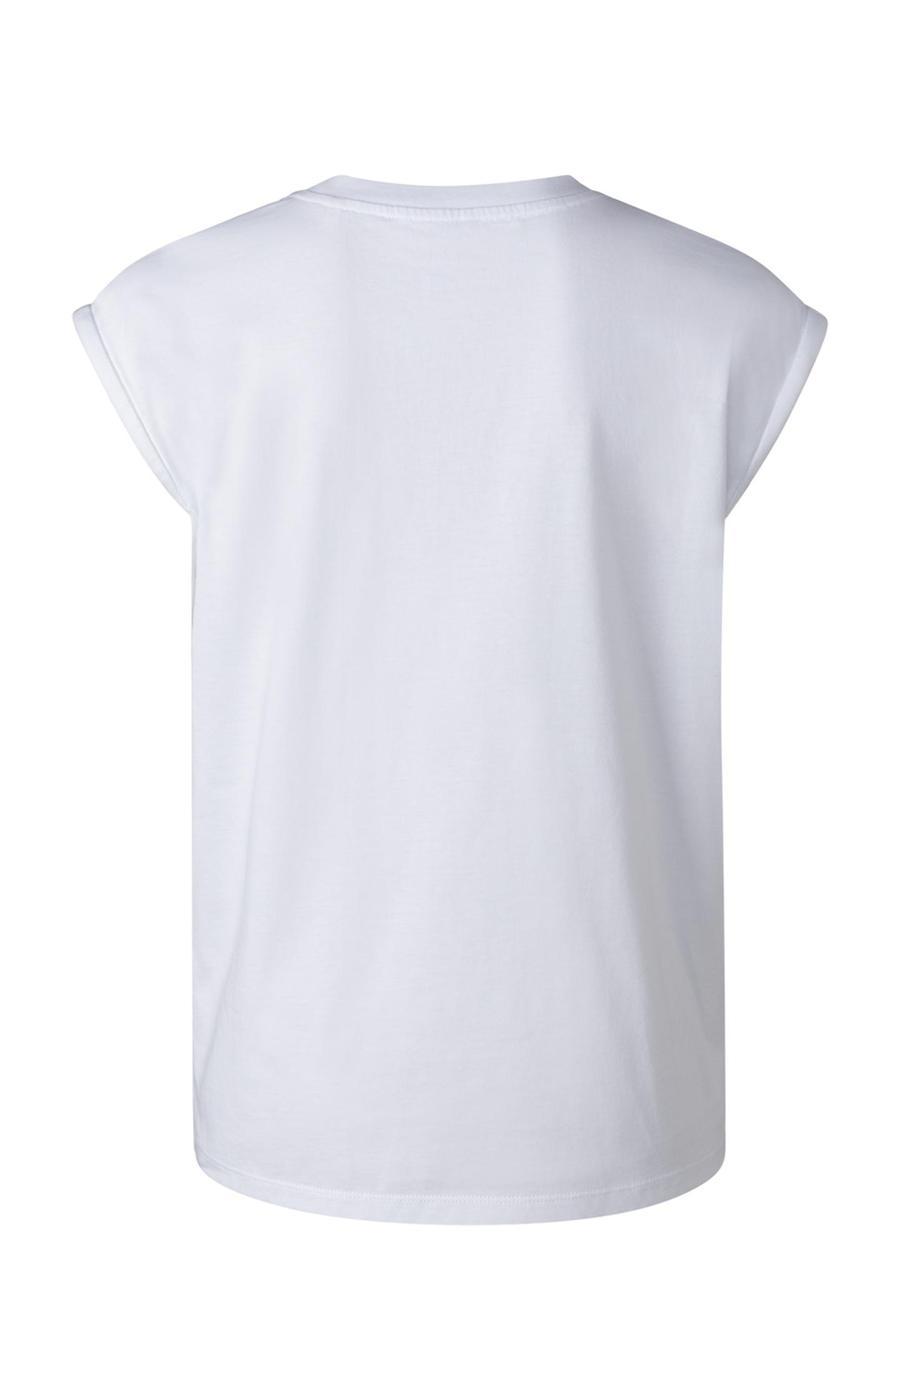 Camiseta Basica sin Mangas Weekend Blanca